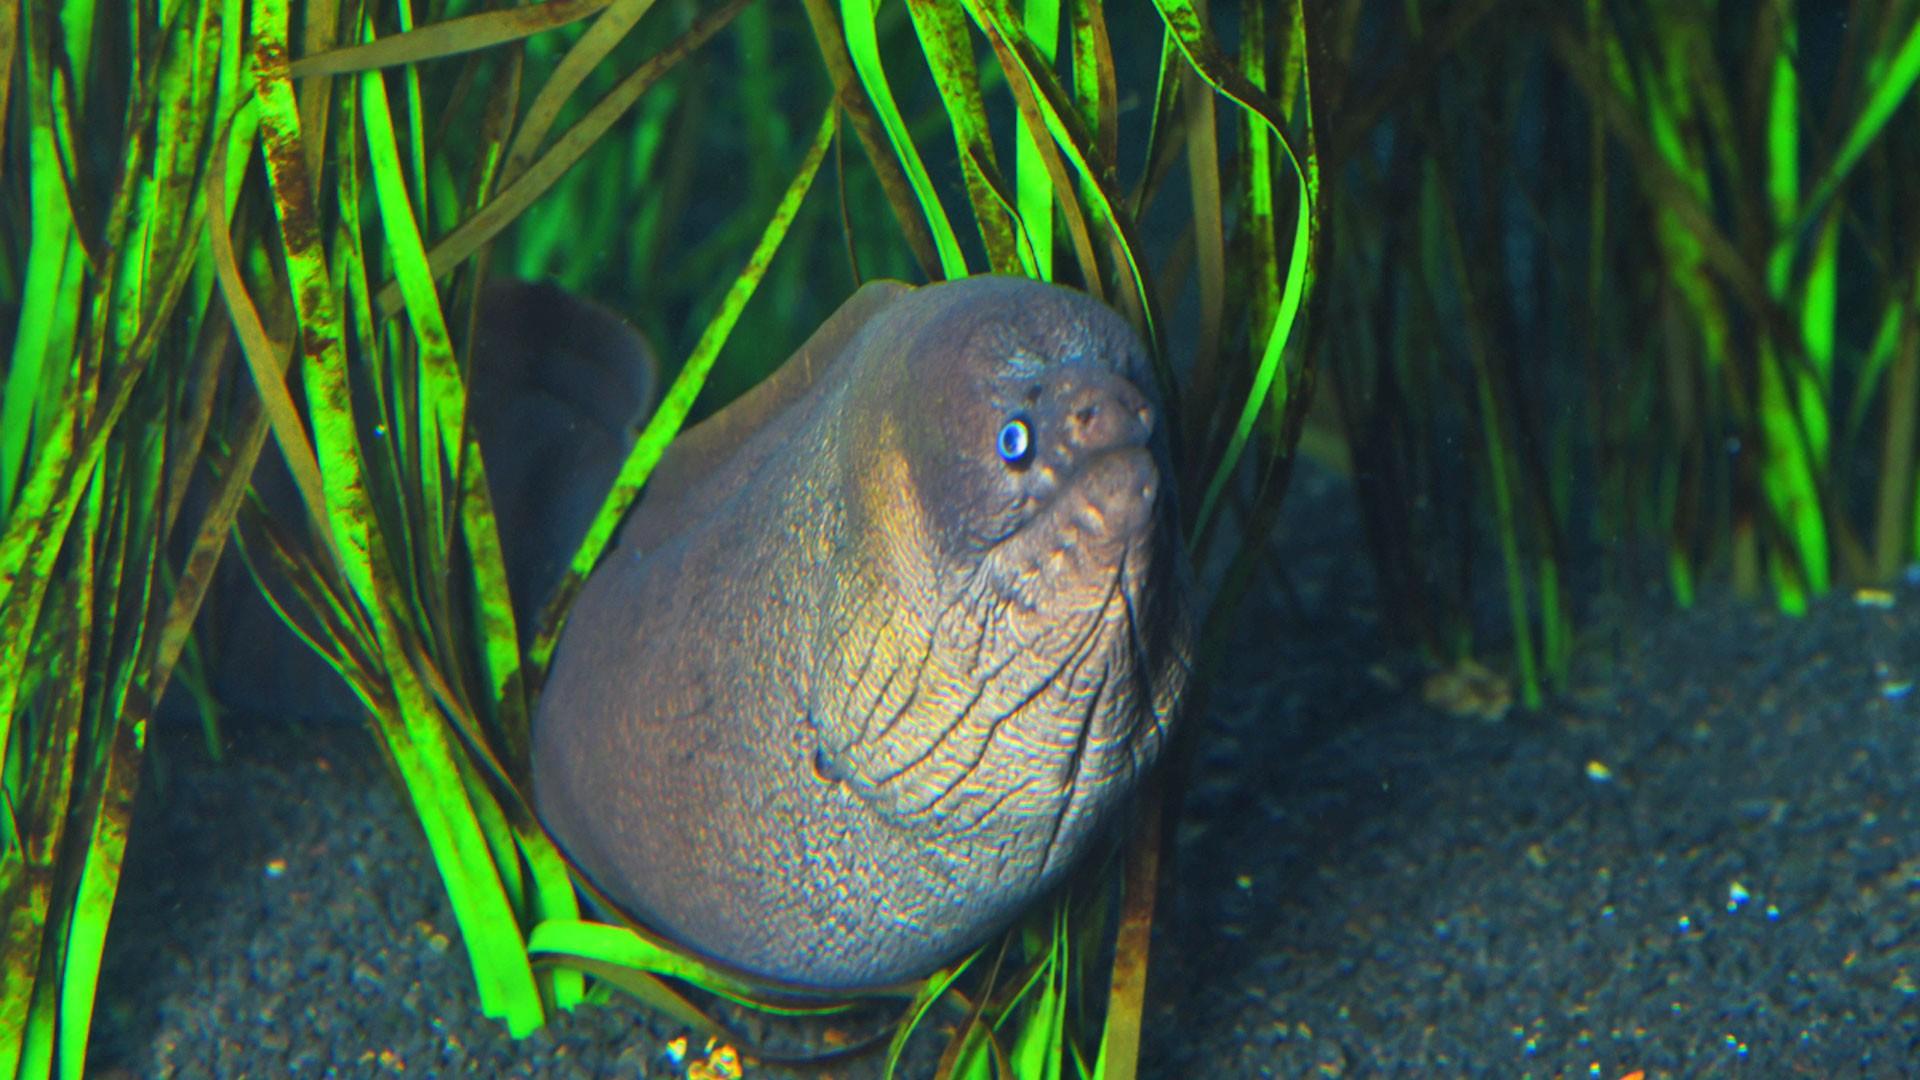 Brown moray eel